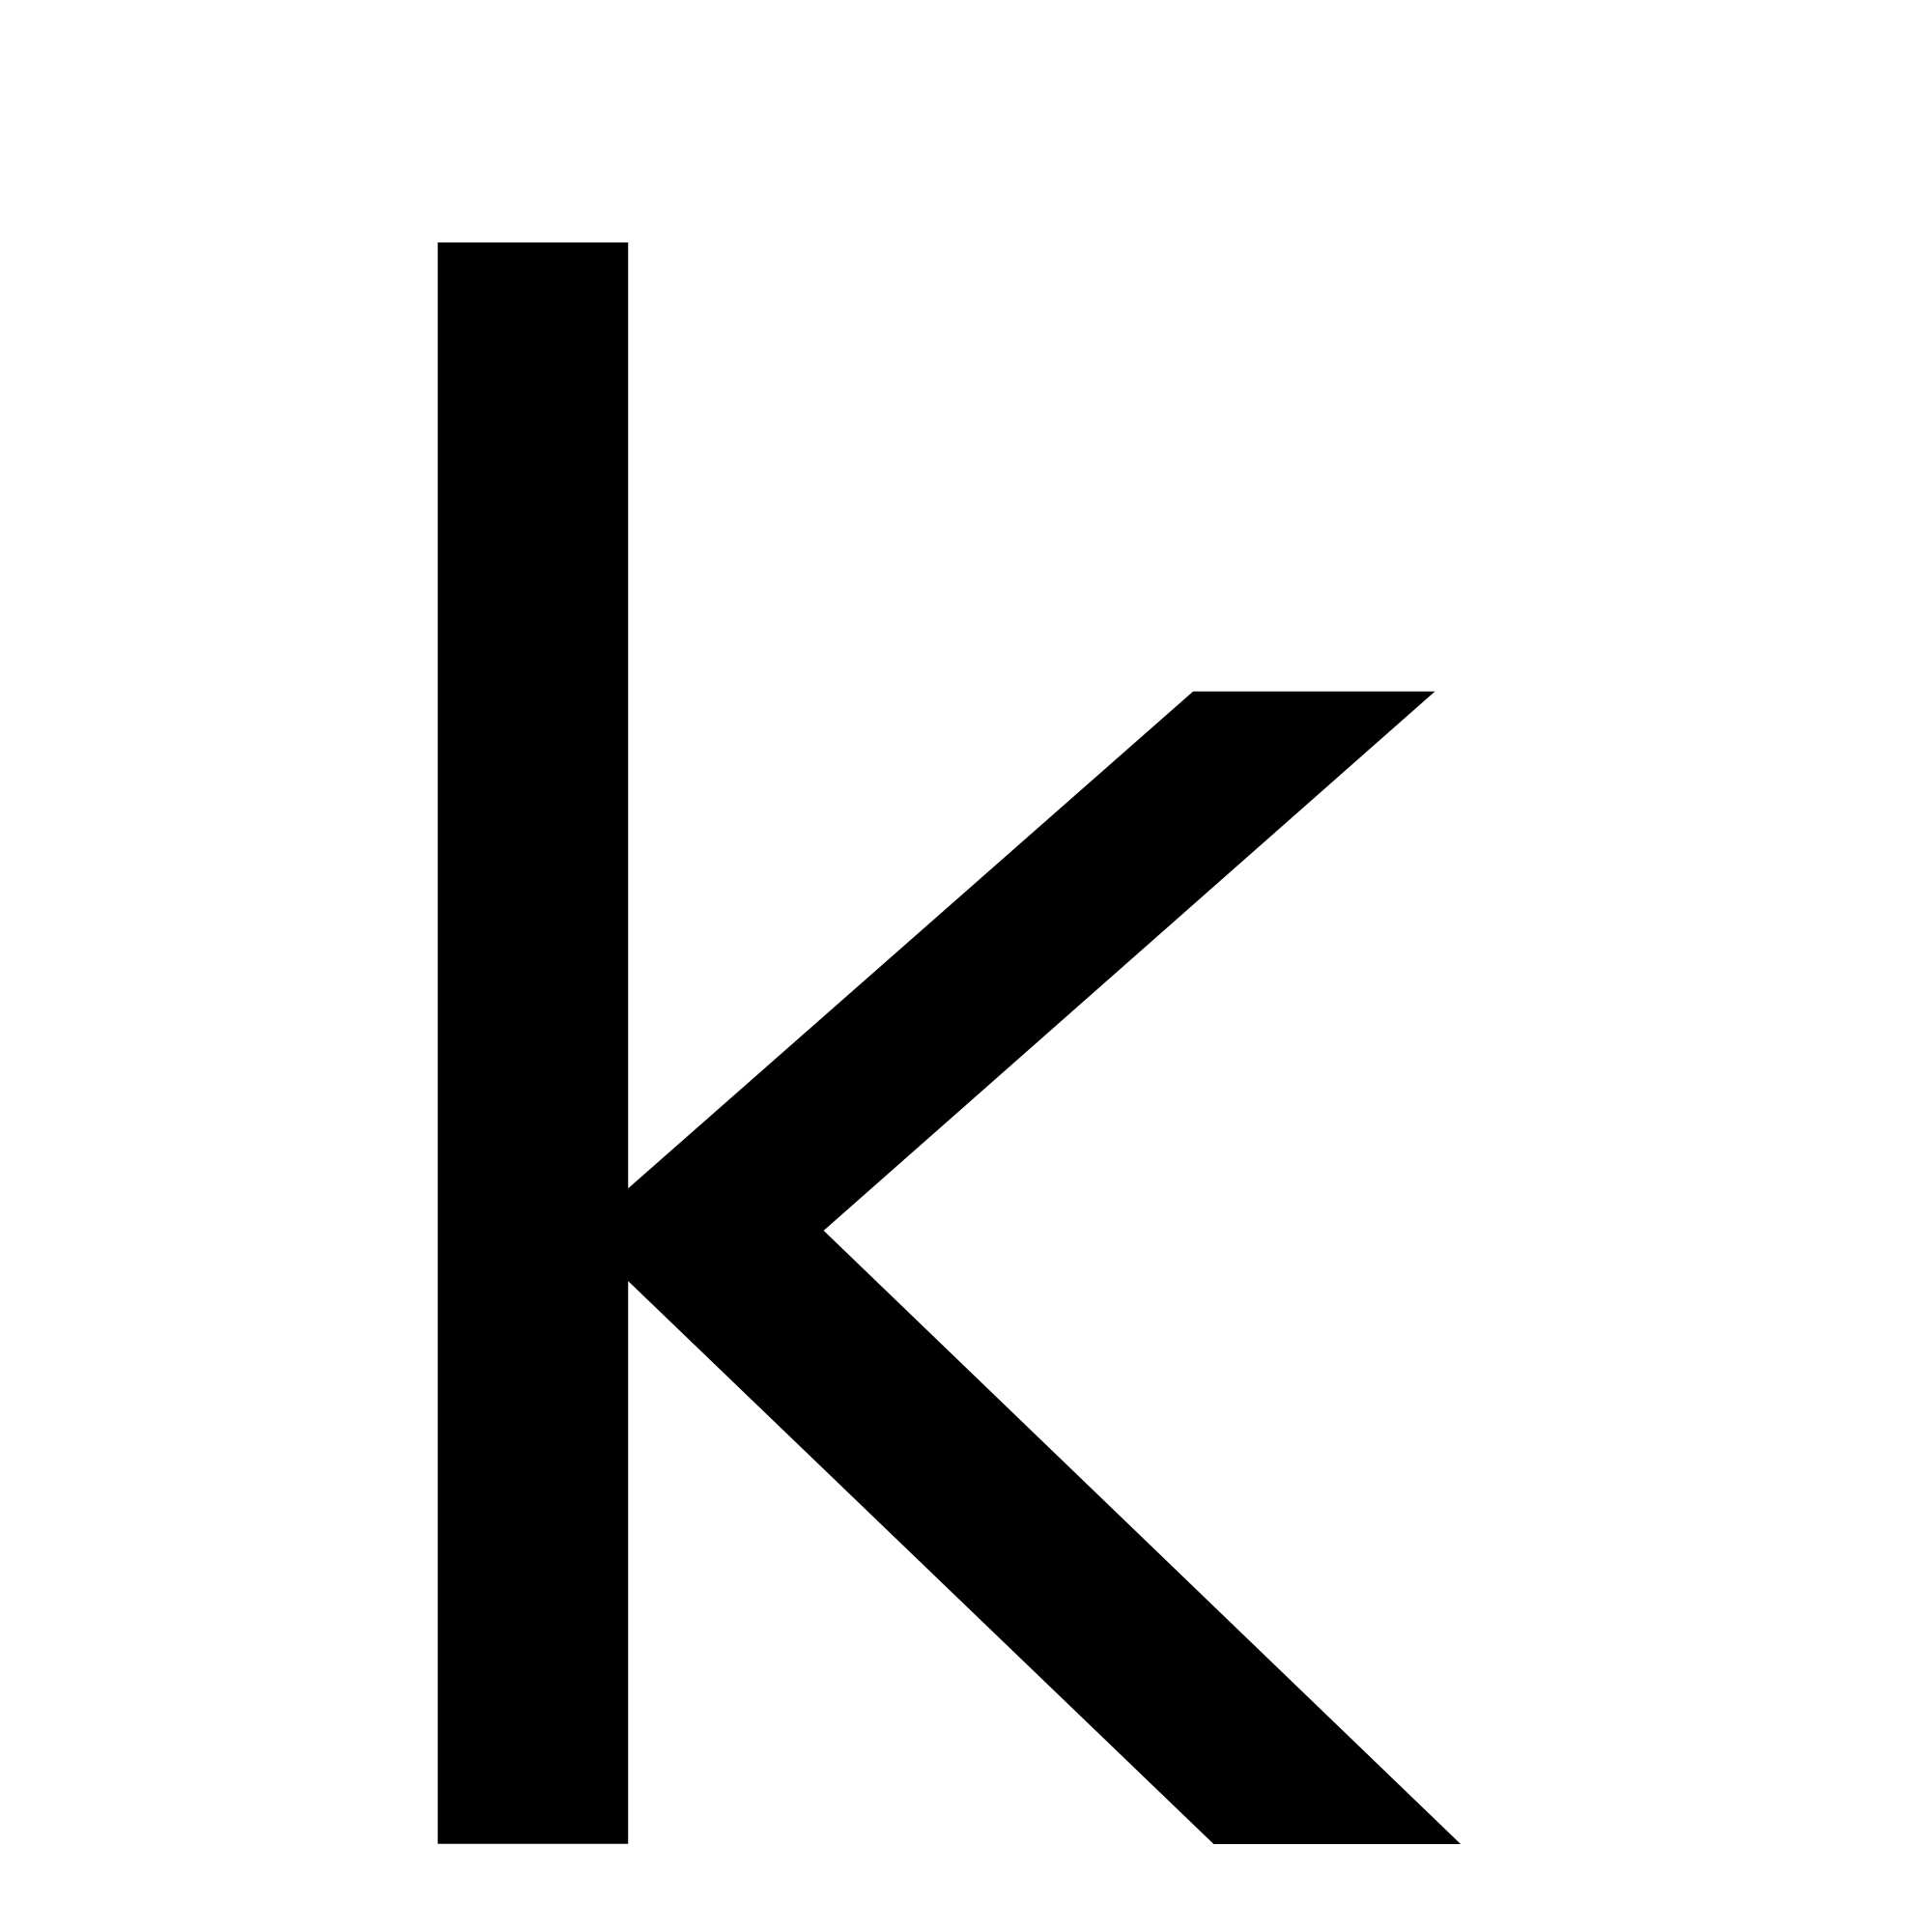 Letter K HD PNG - 92235